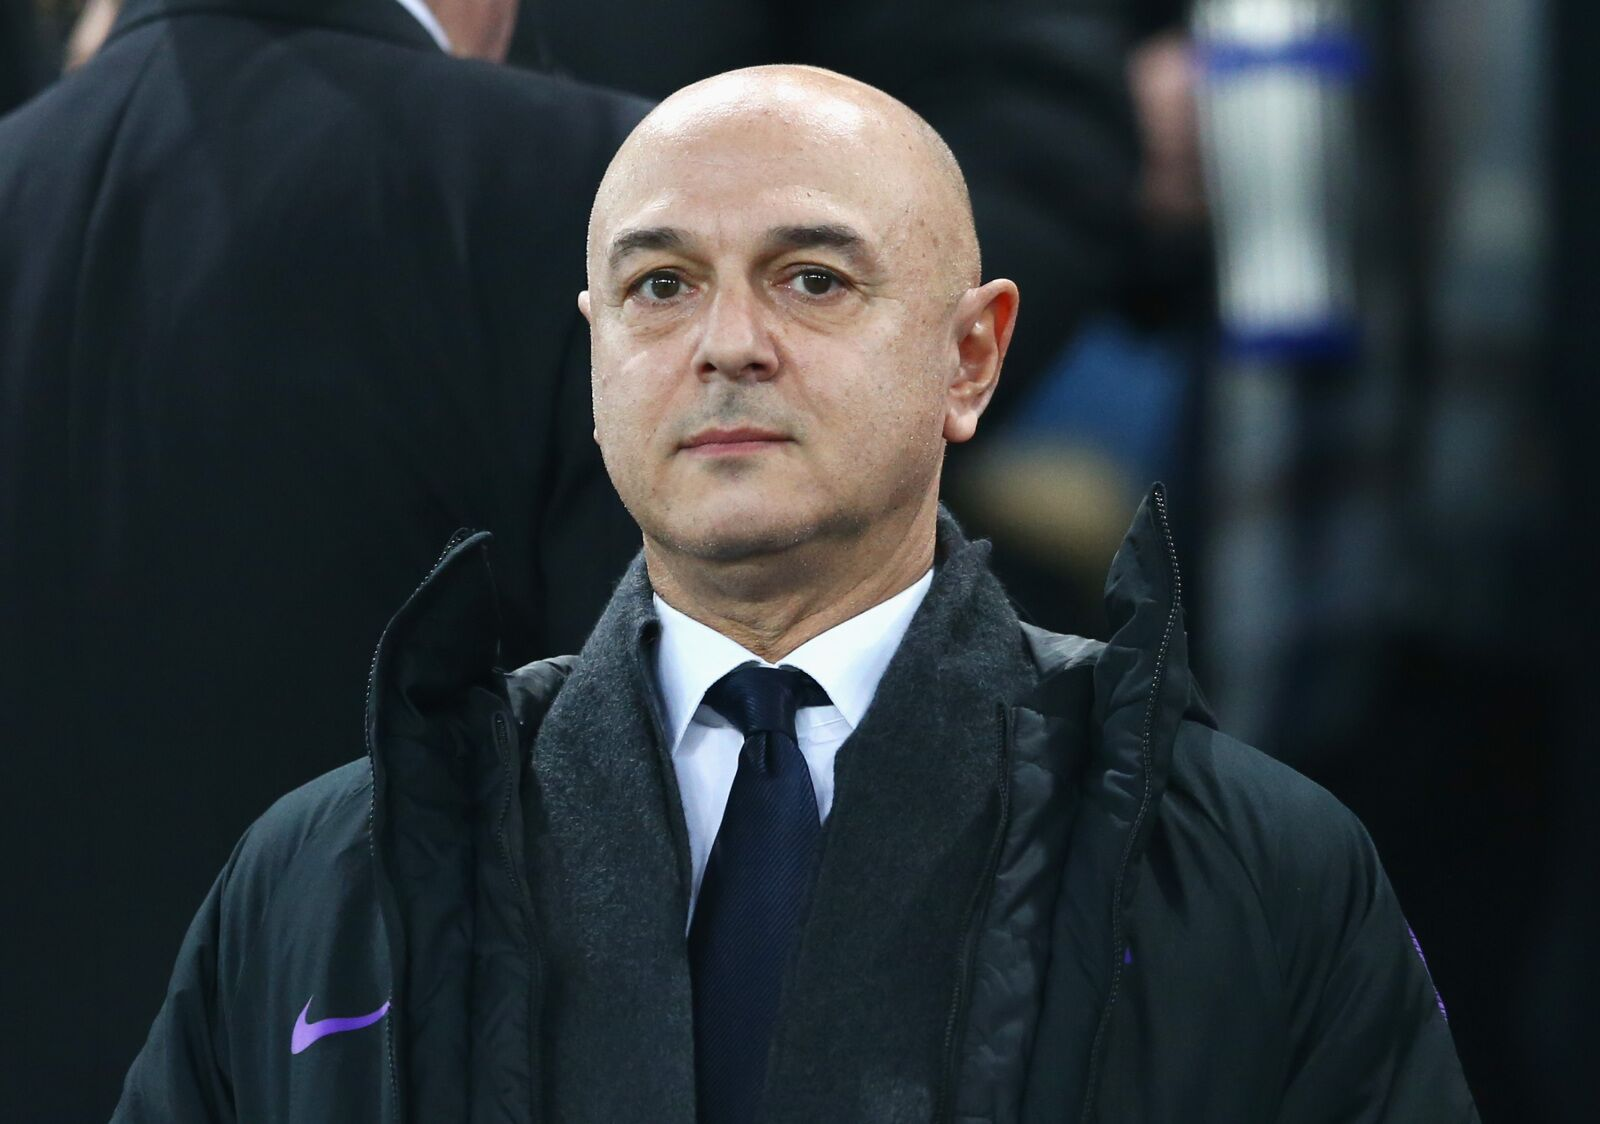 Tottenham's Champions League run has changed Levy